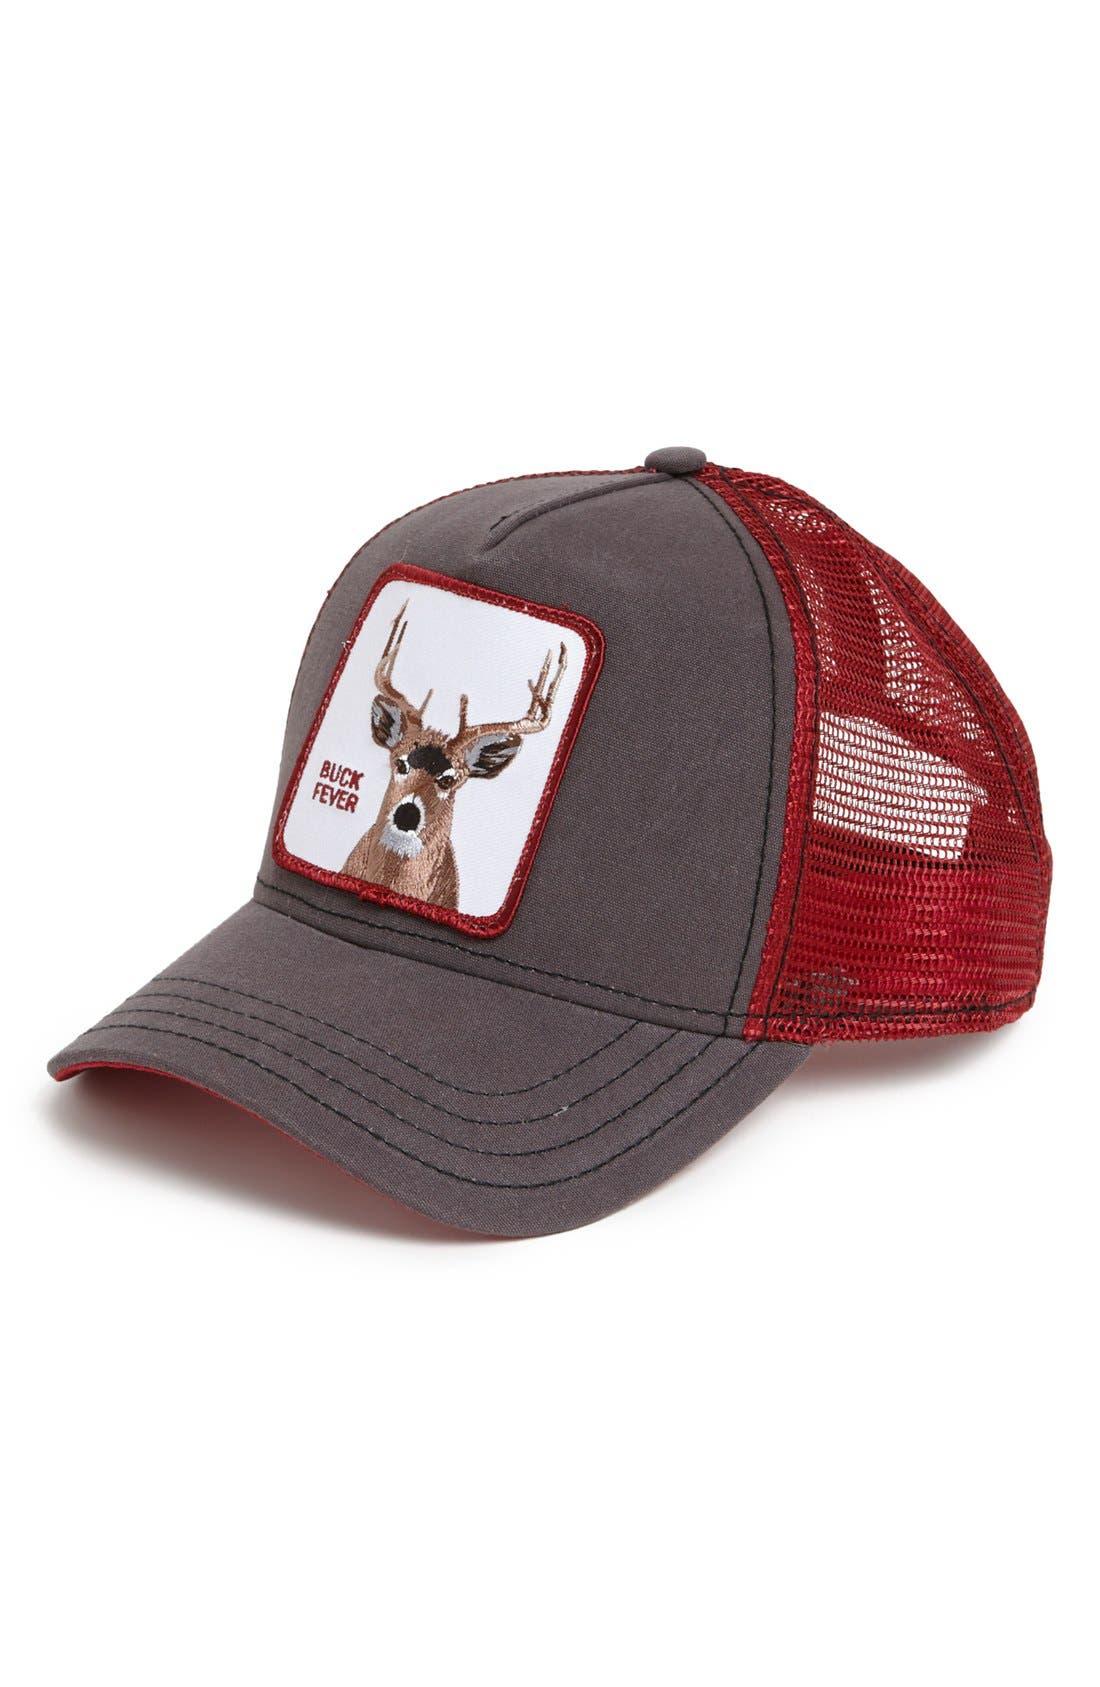 GOORIN BROTHERS Animal Farm - Buck Fever Trucker Cap